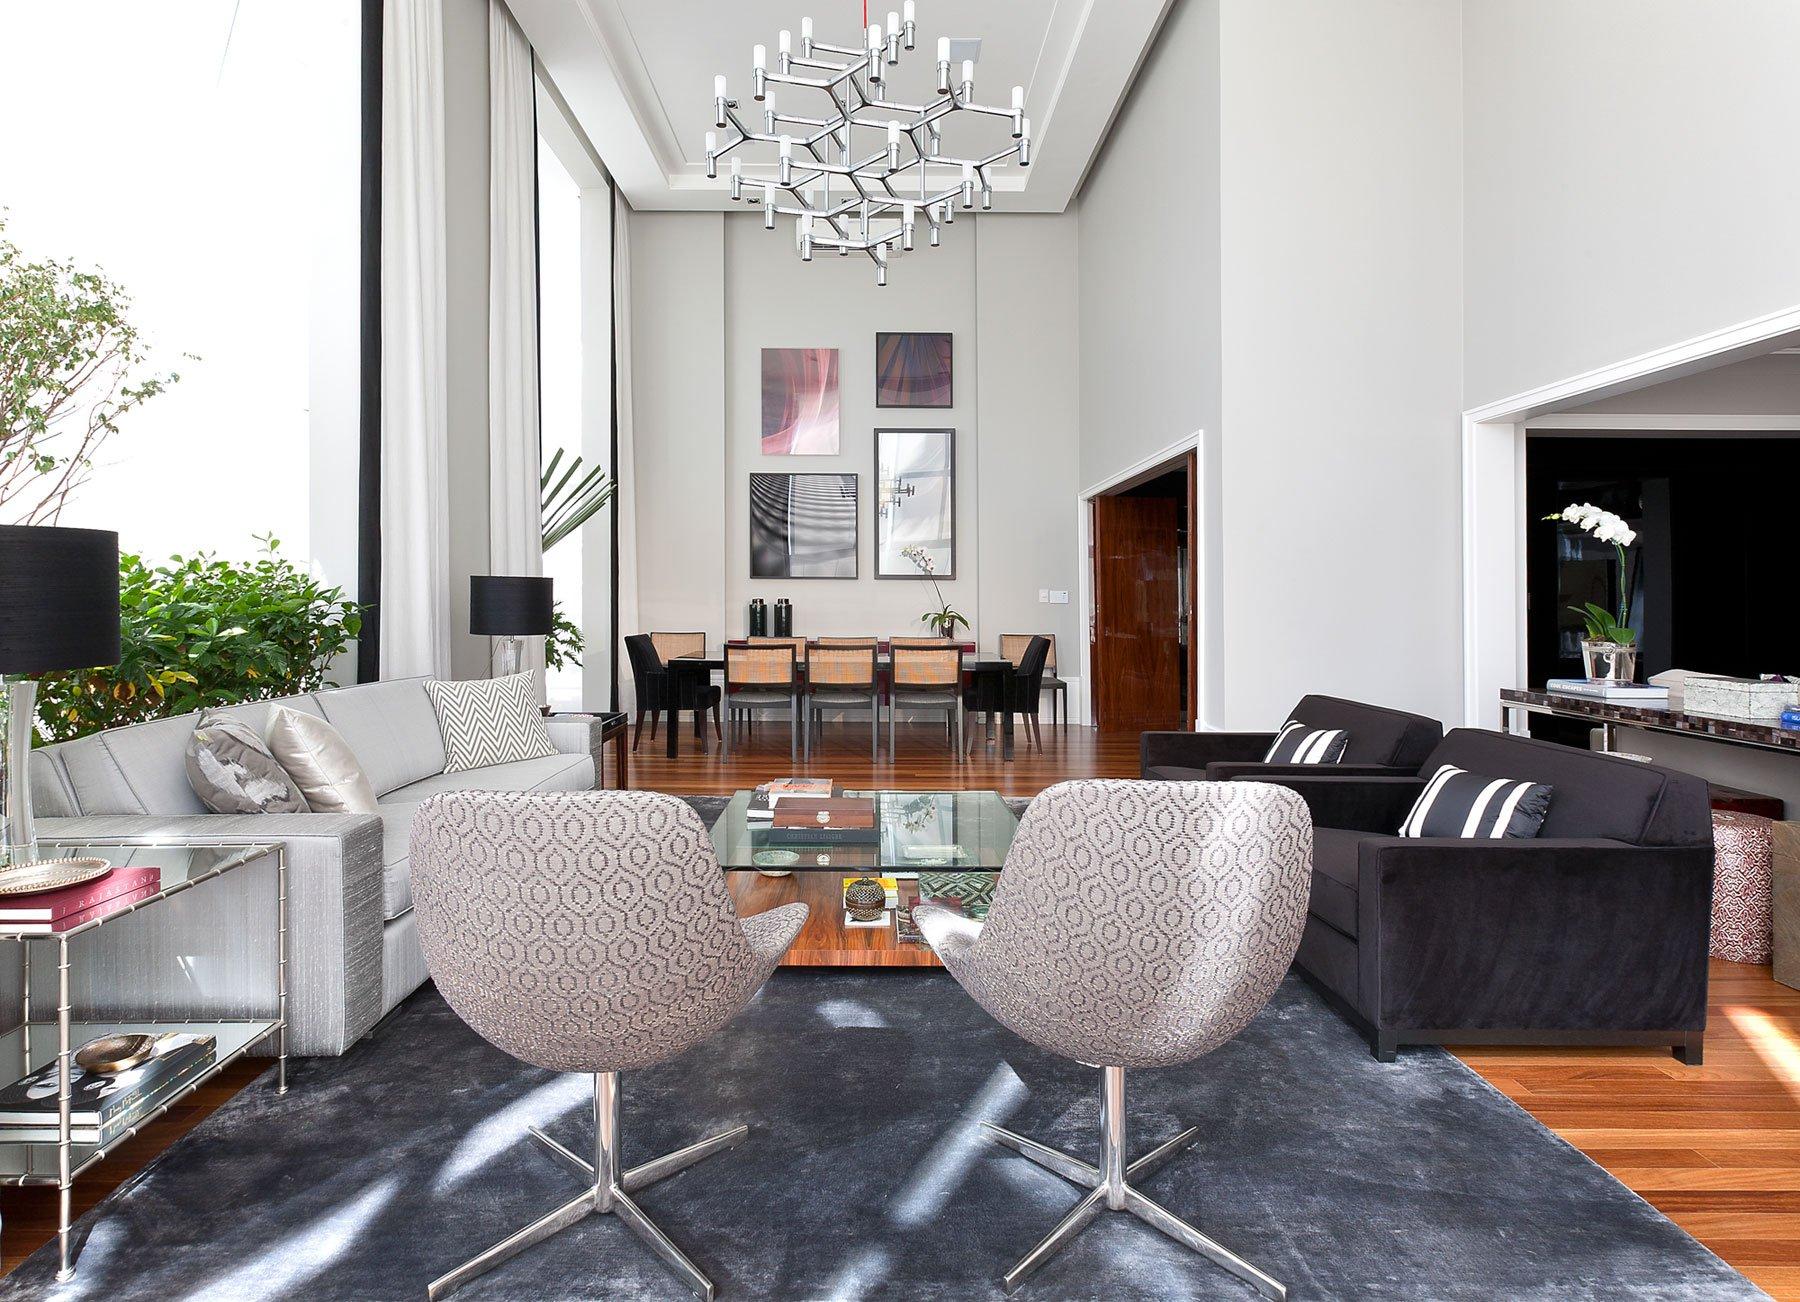 An-Elegant-Interior-01